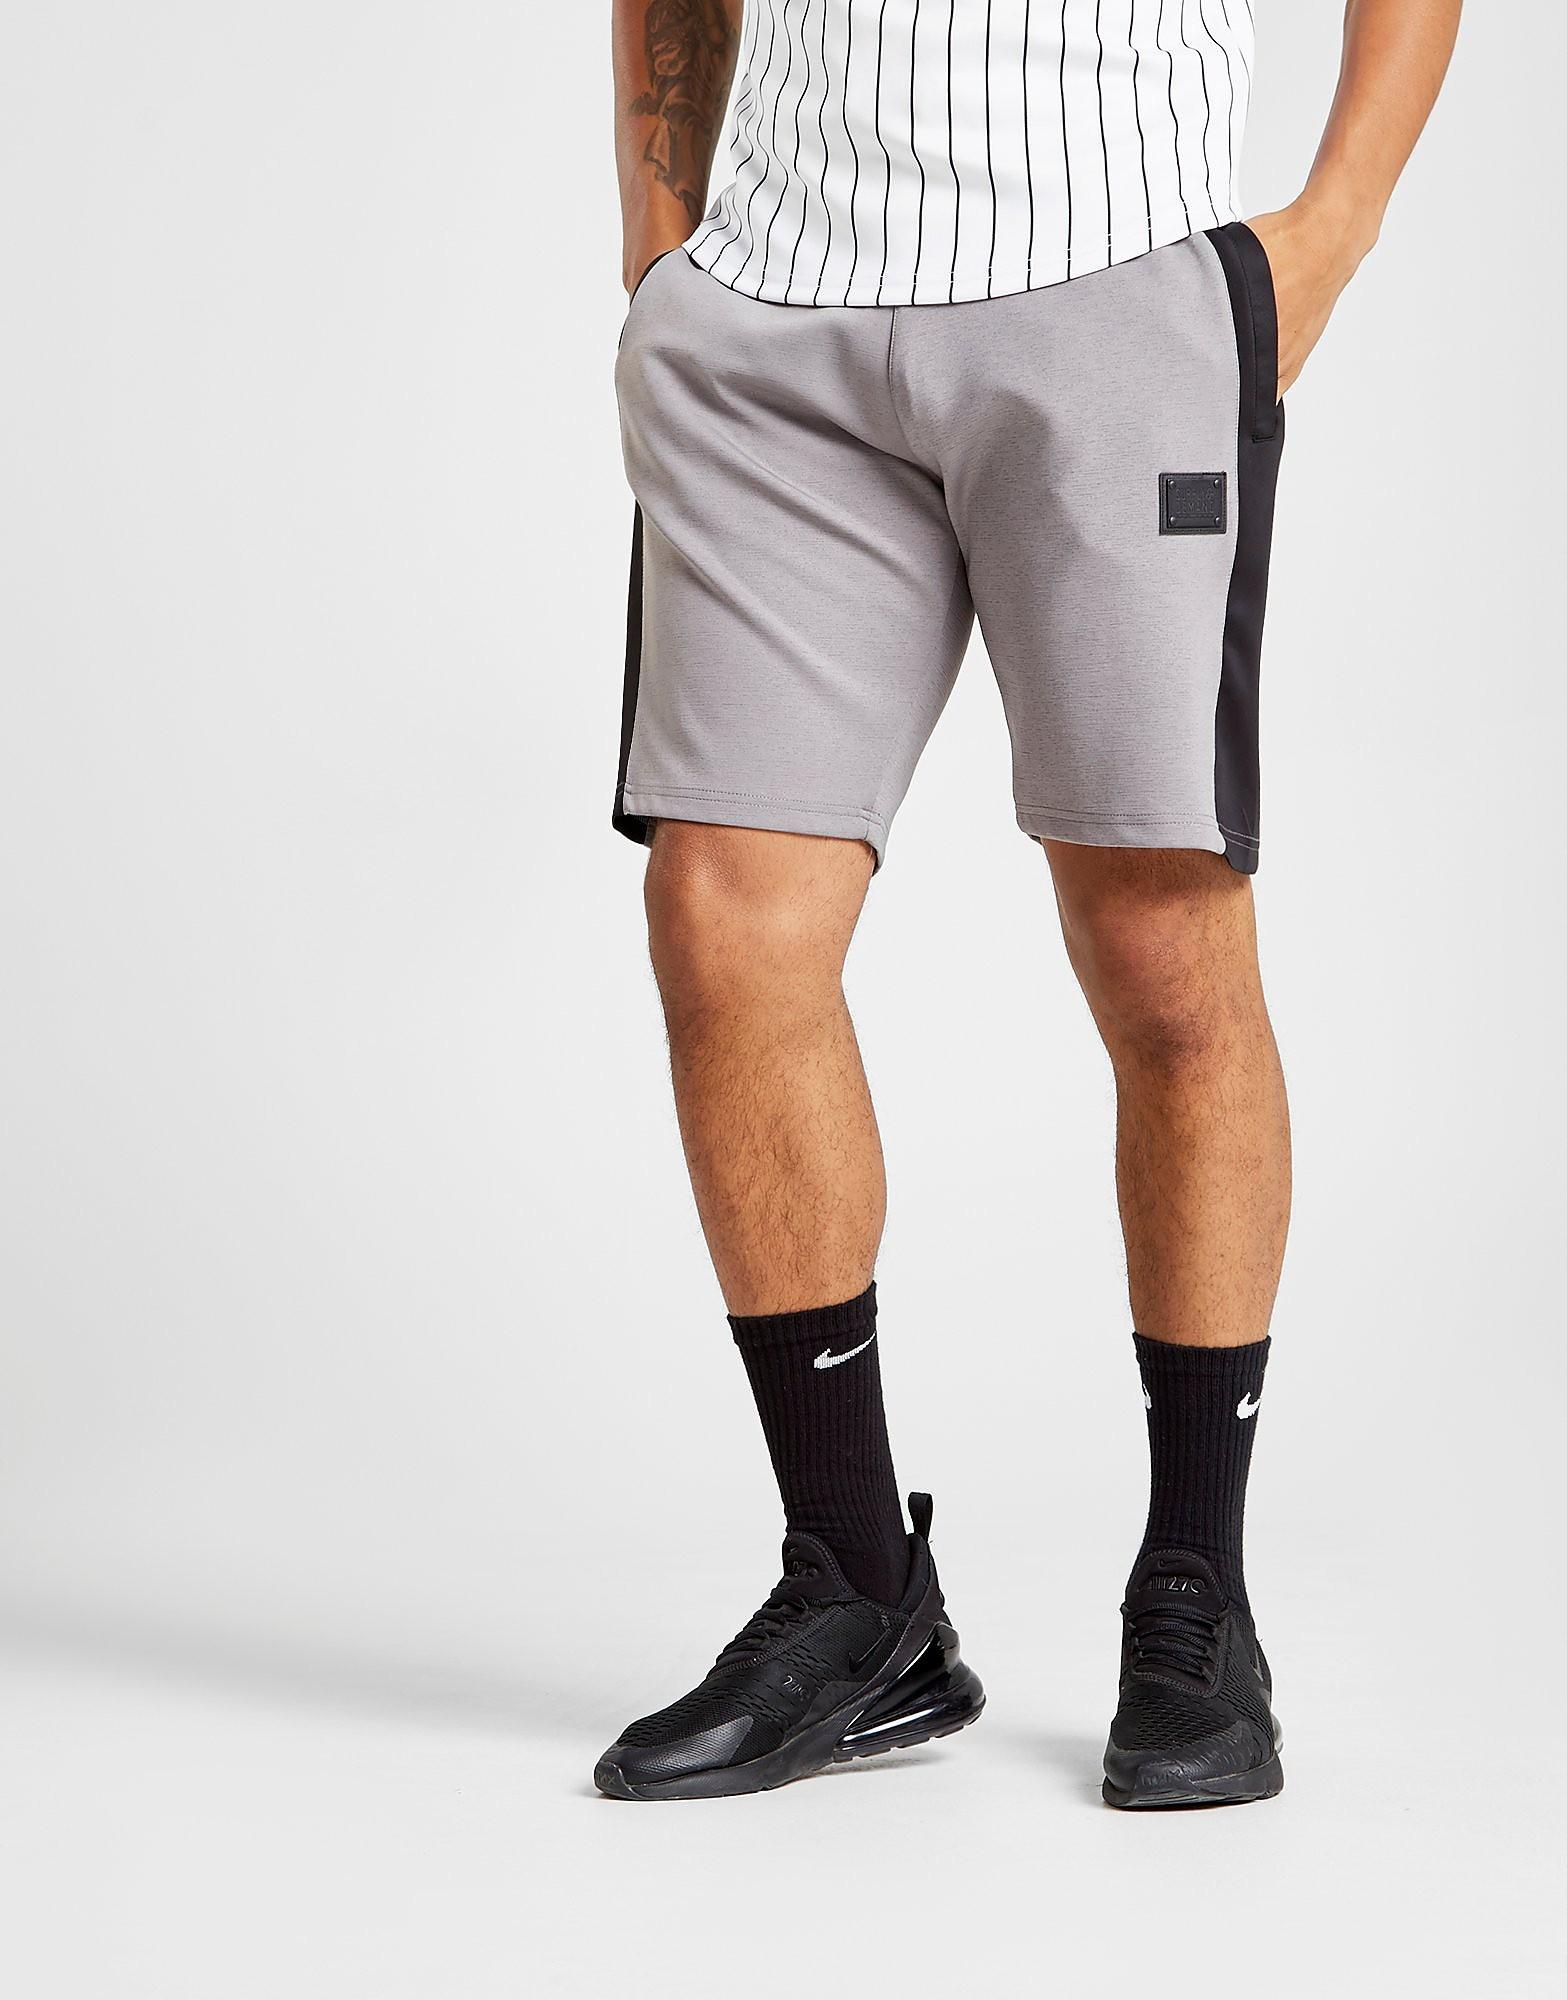 Supply & Demand pantalón corto Slide